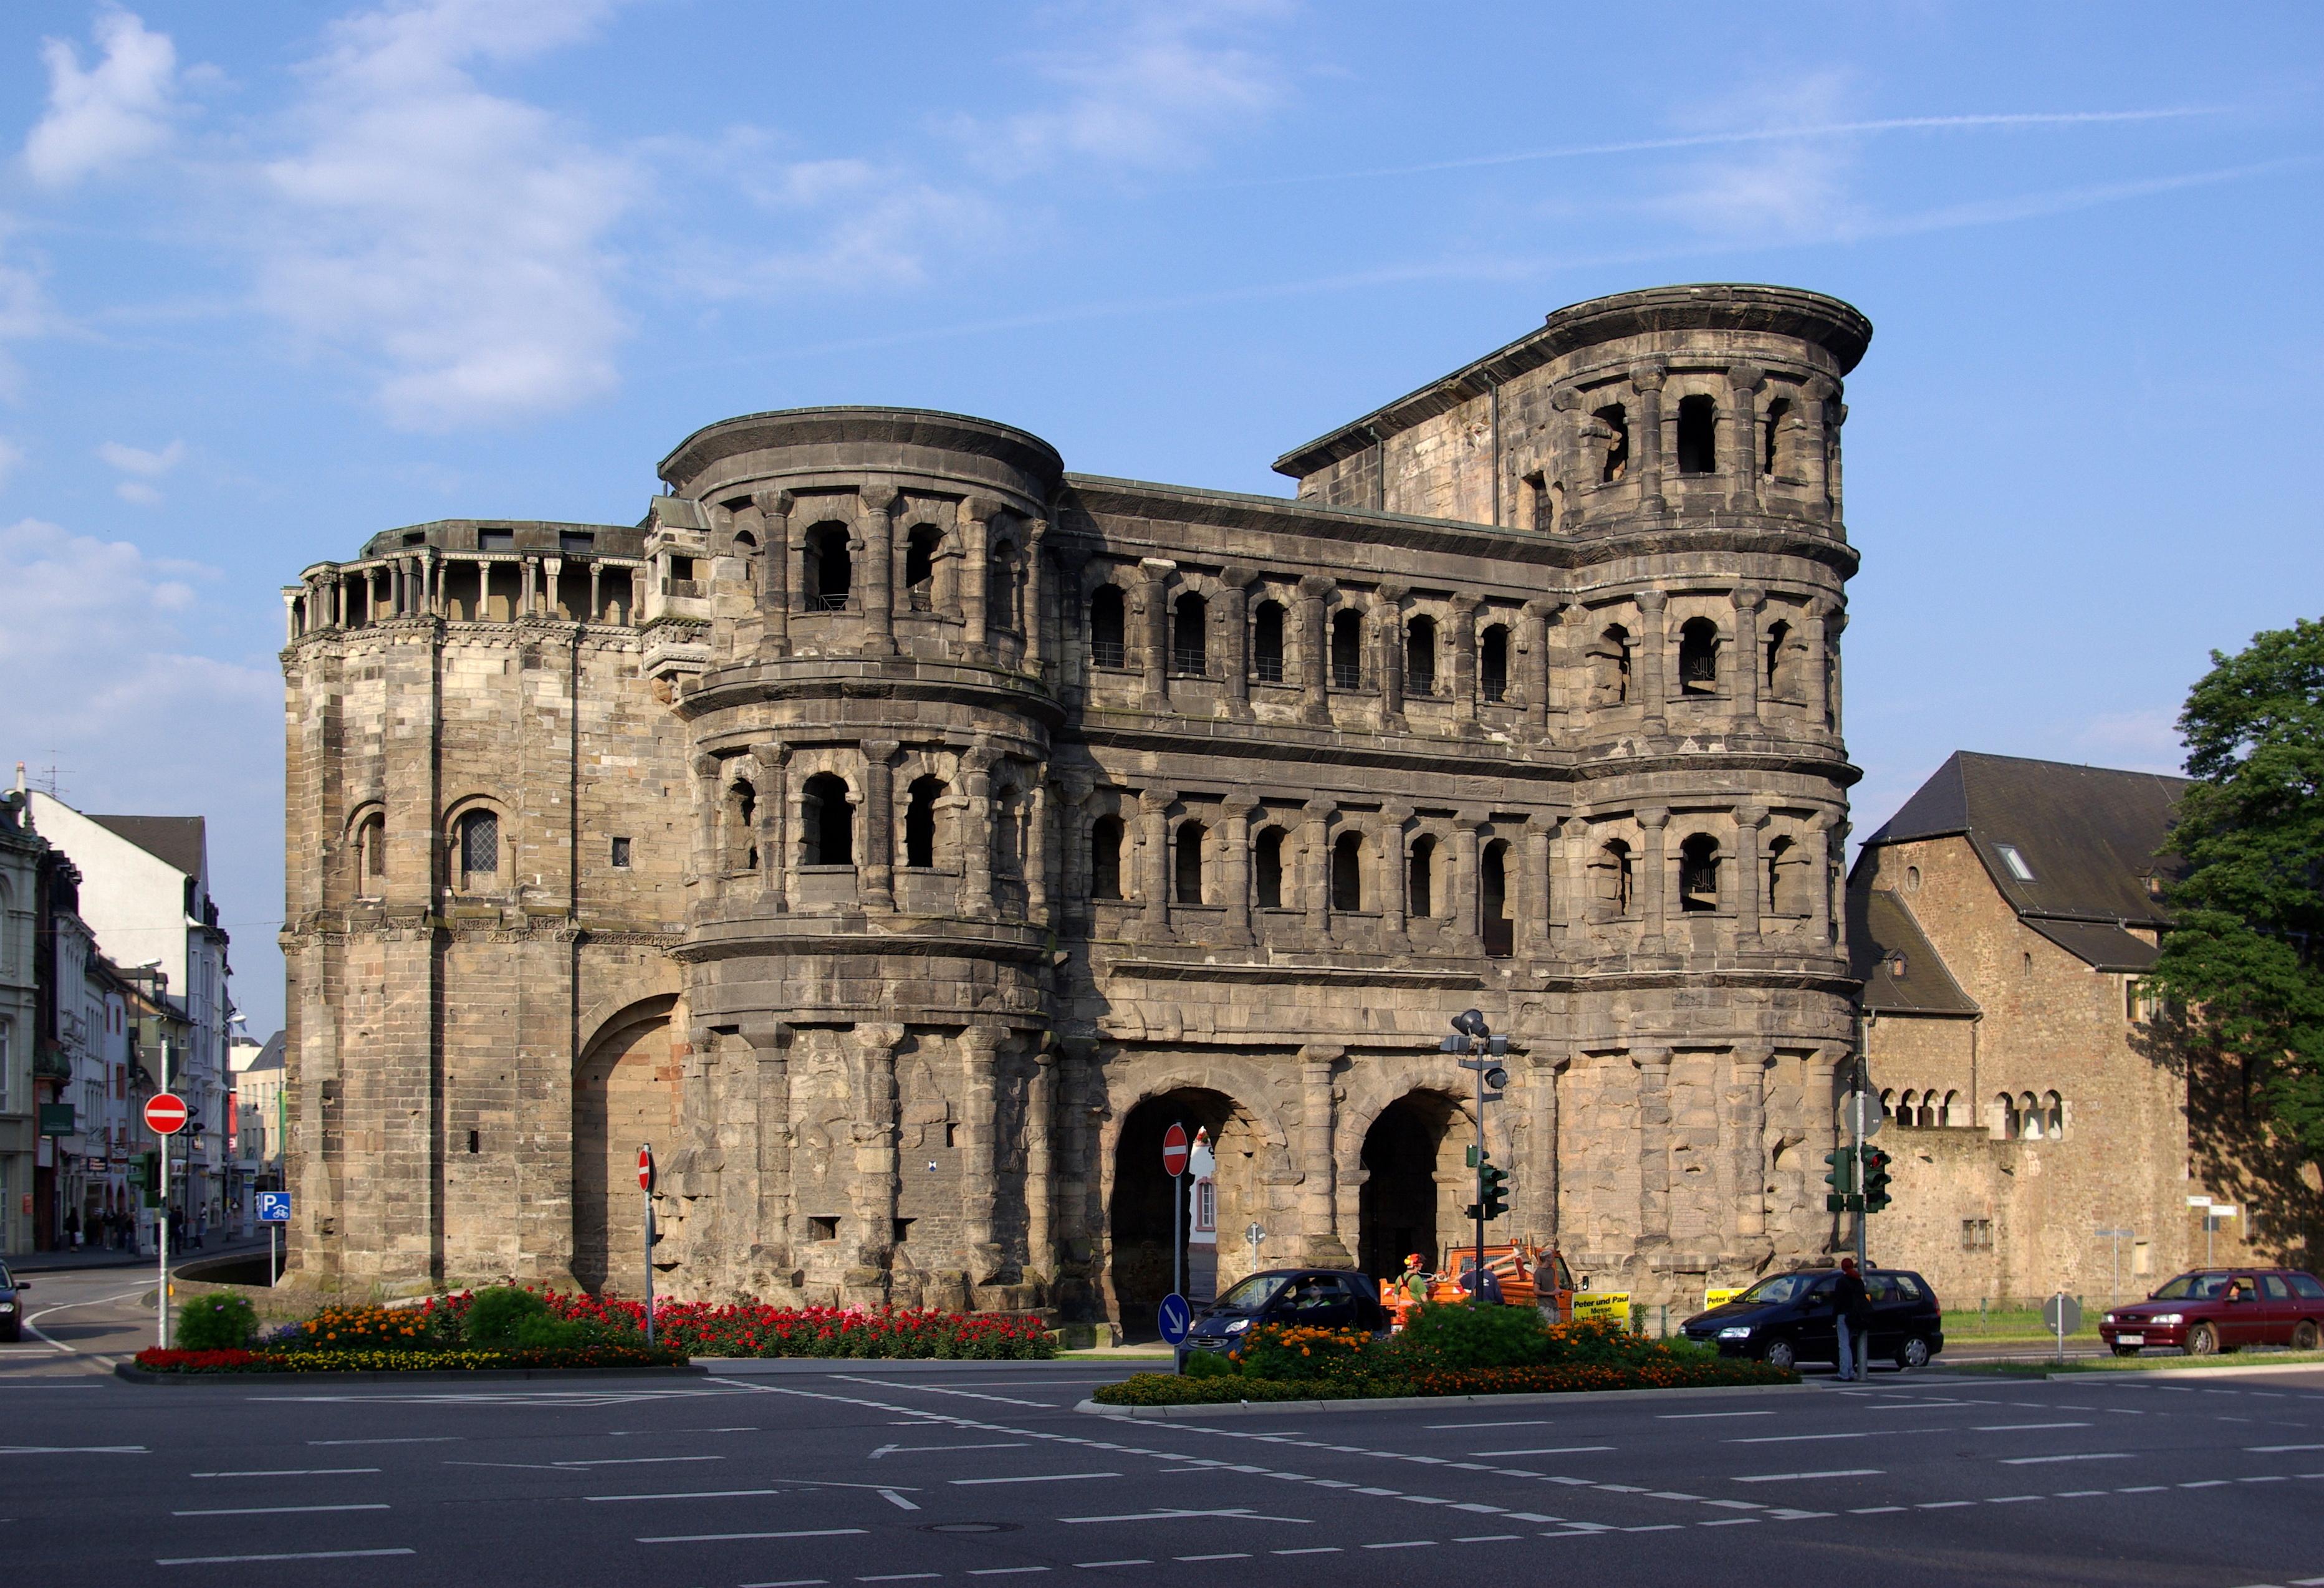 http://upload.wikimedia.org/wikipedia/commons/e/ee/Trier_Porta_Nigra_BW_1.JPG